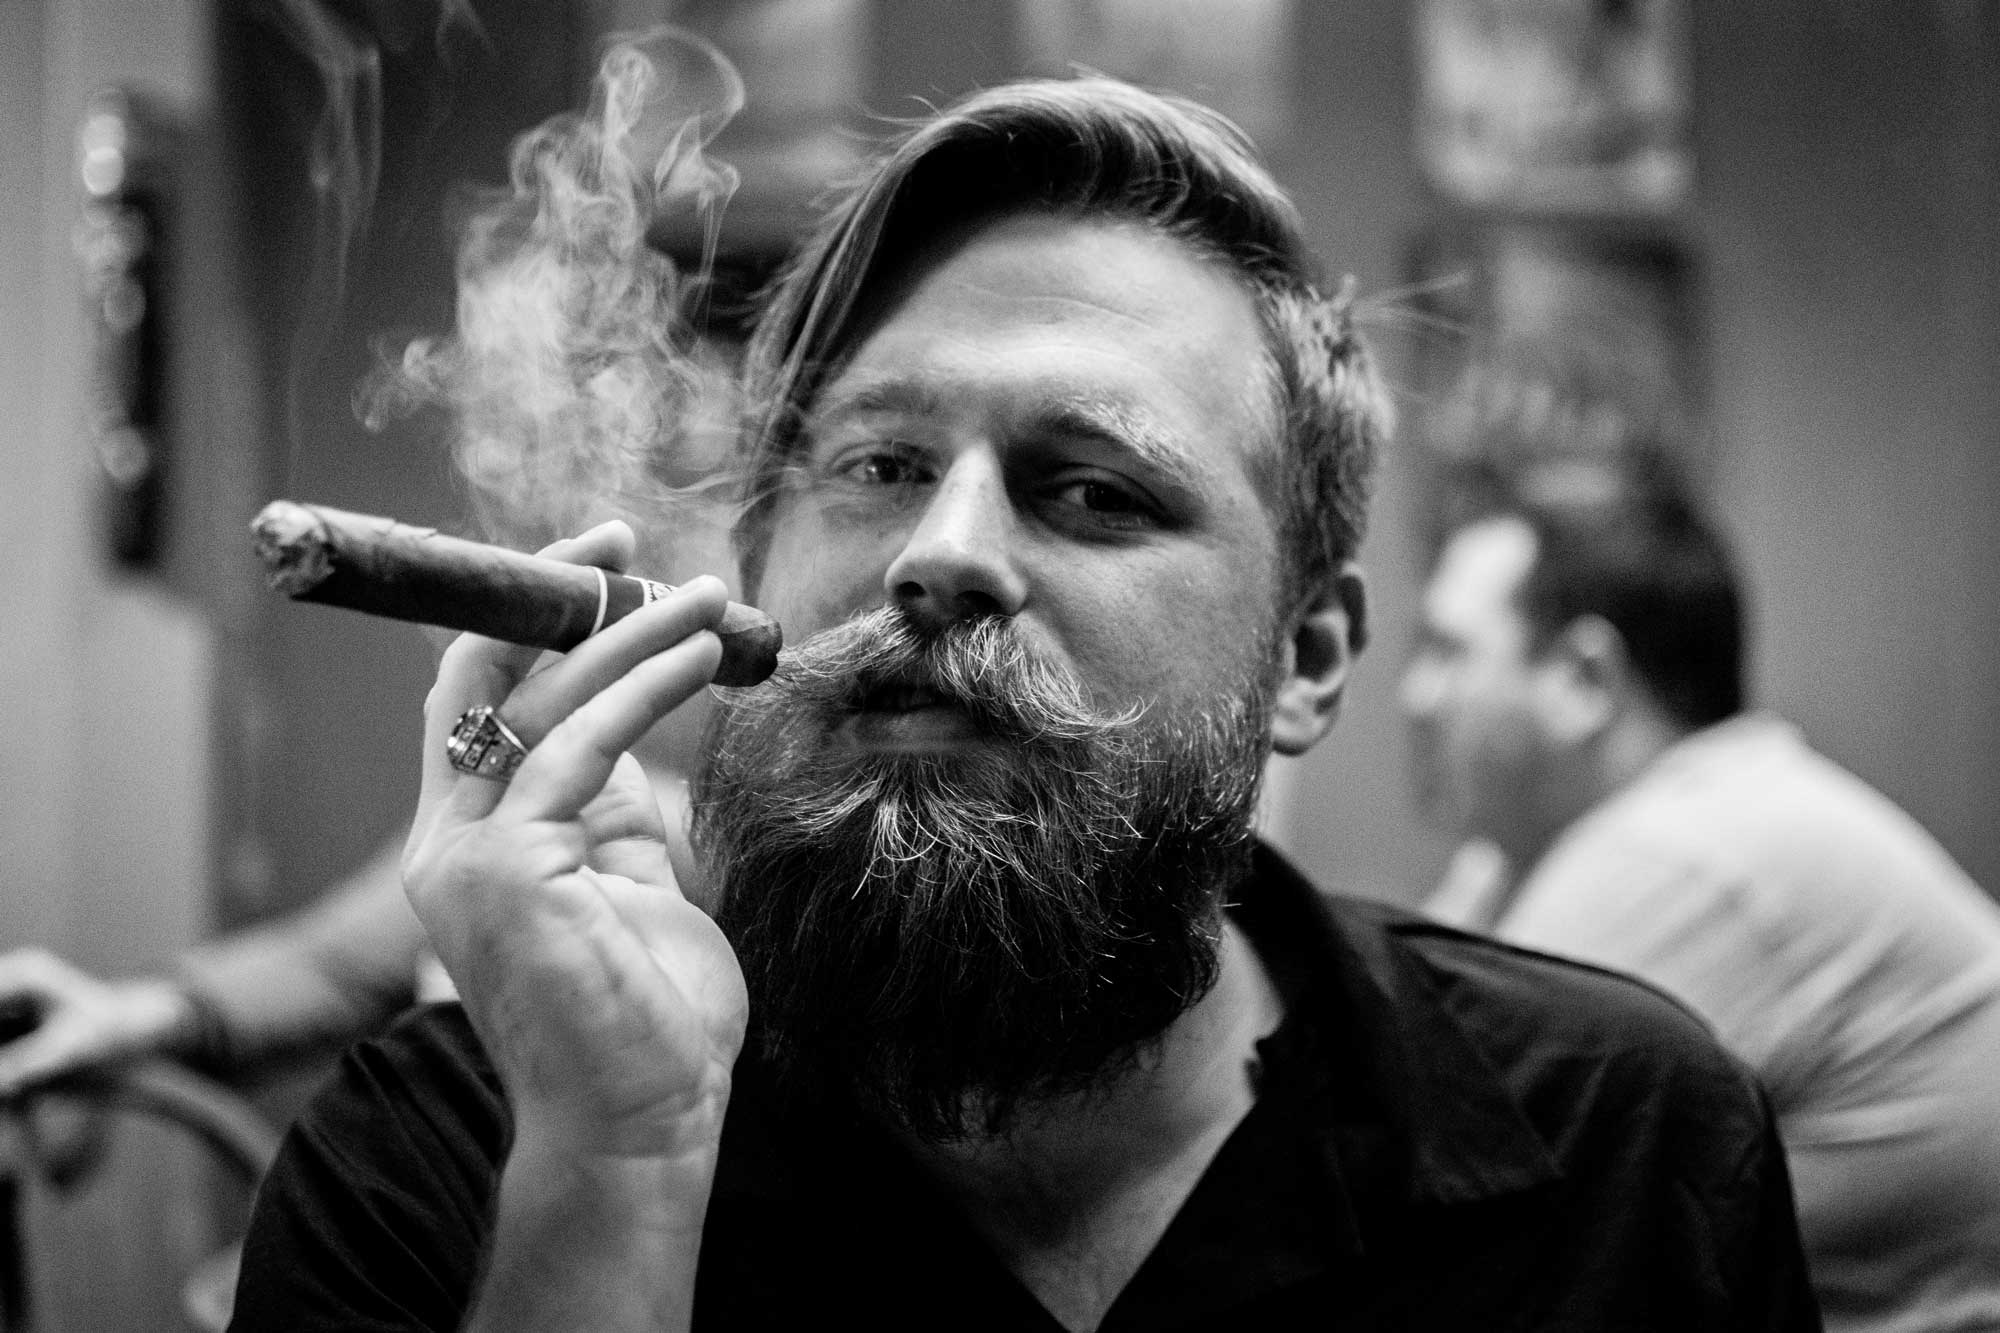 Smoking cigar with asshole, sue gafner nude